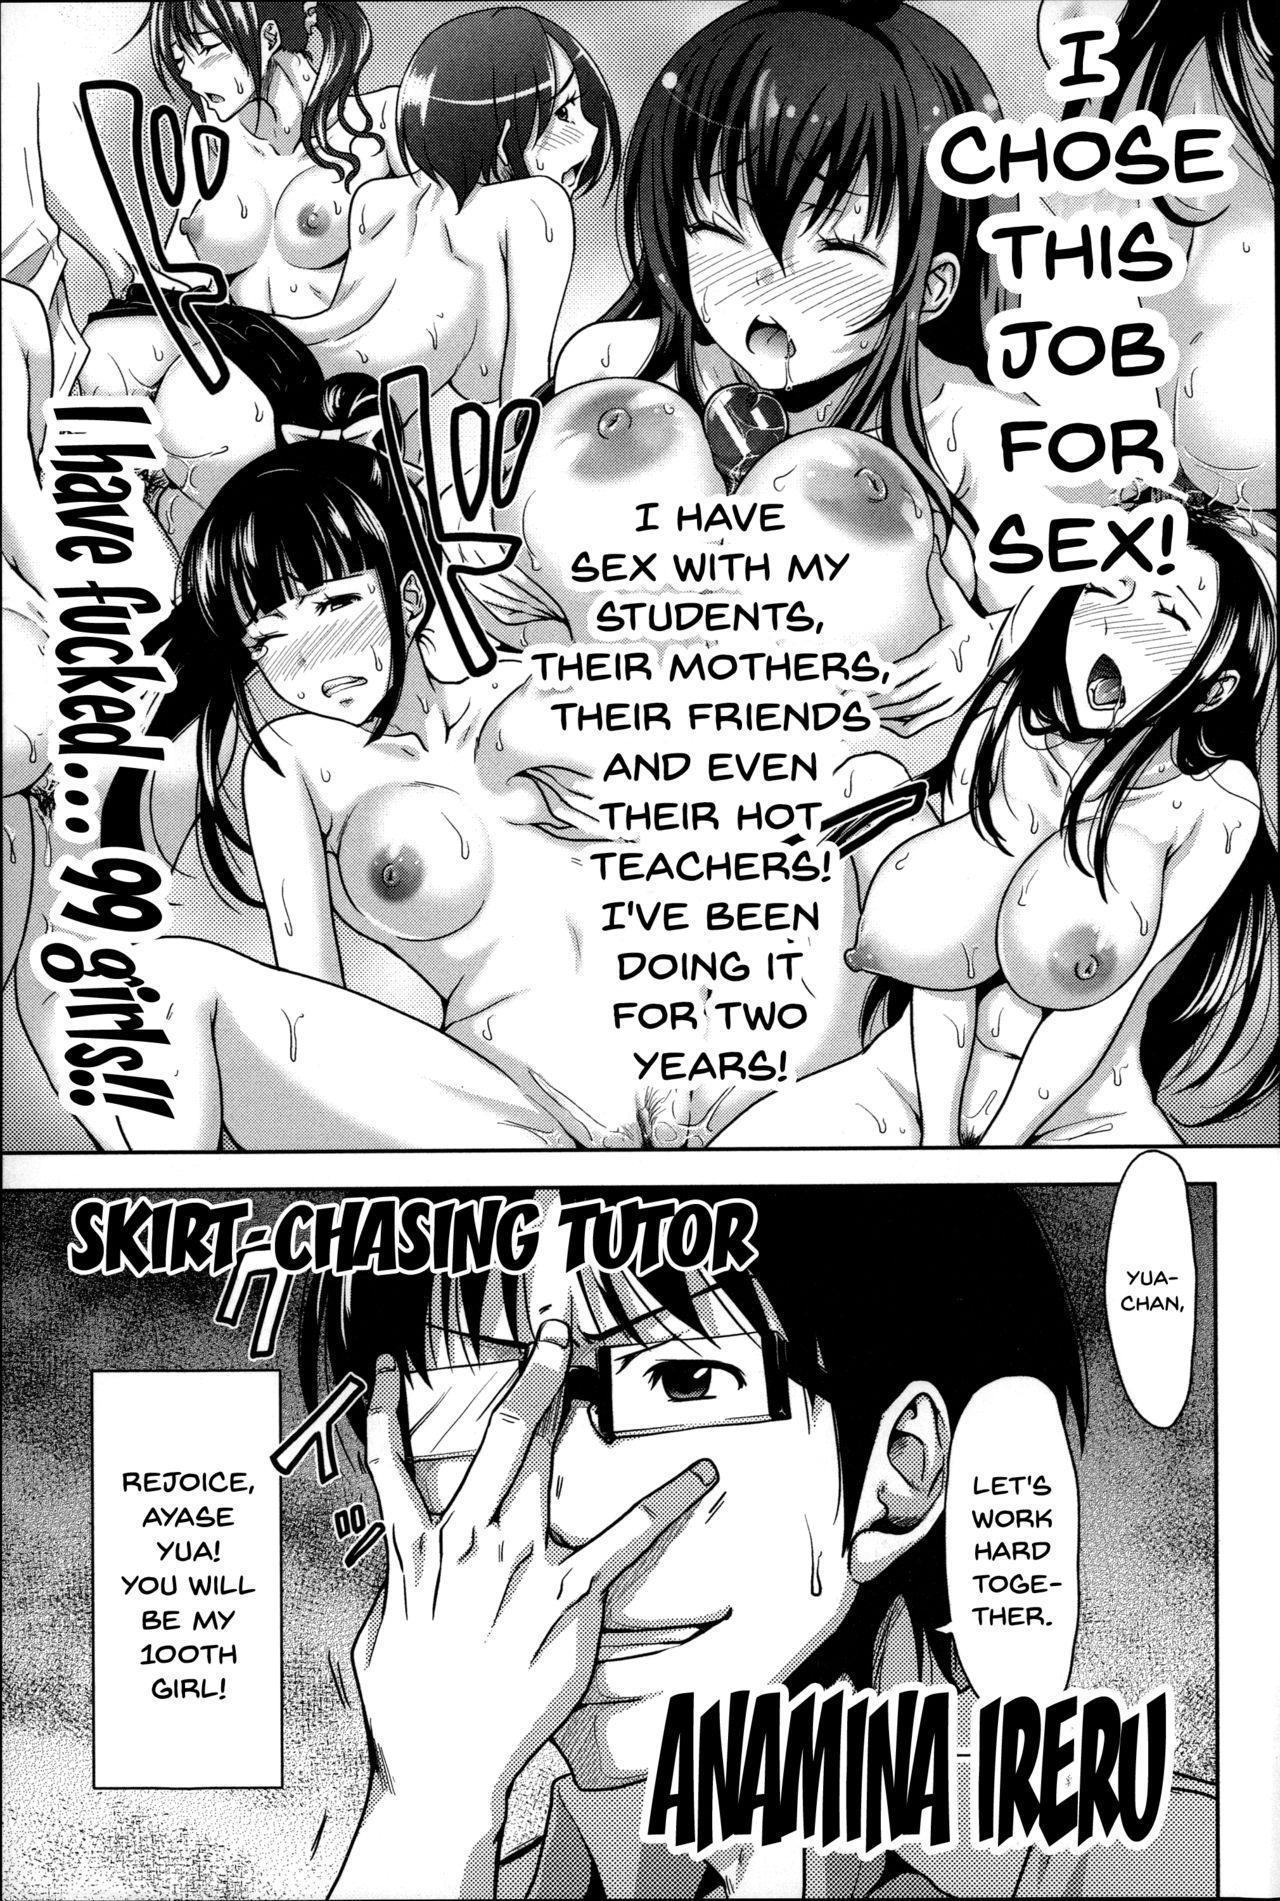 Pakotate! Seikouritsu 0% no Teppeki Bishojo VS Seikouritsu 100% no Hentai Katei Kyoushi   Pakotate! Sex Rate 0% Iron-Willed Beautiful Virgins VS Sex Rate 100% Perverted Coach 10